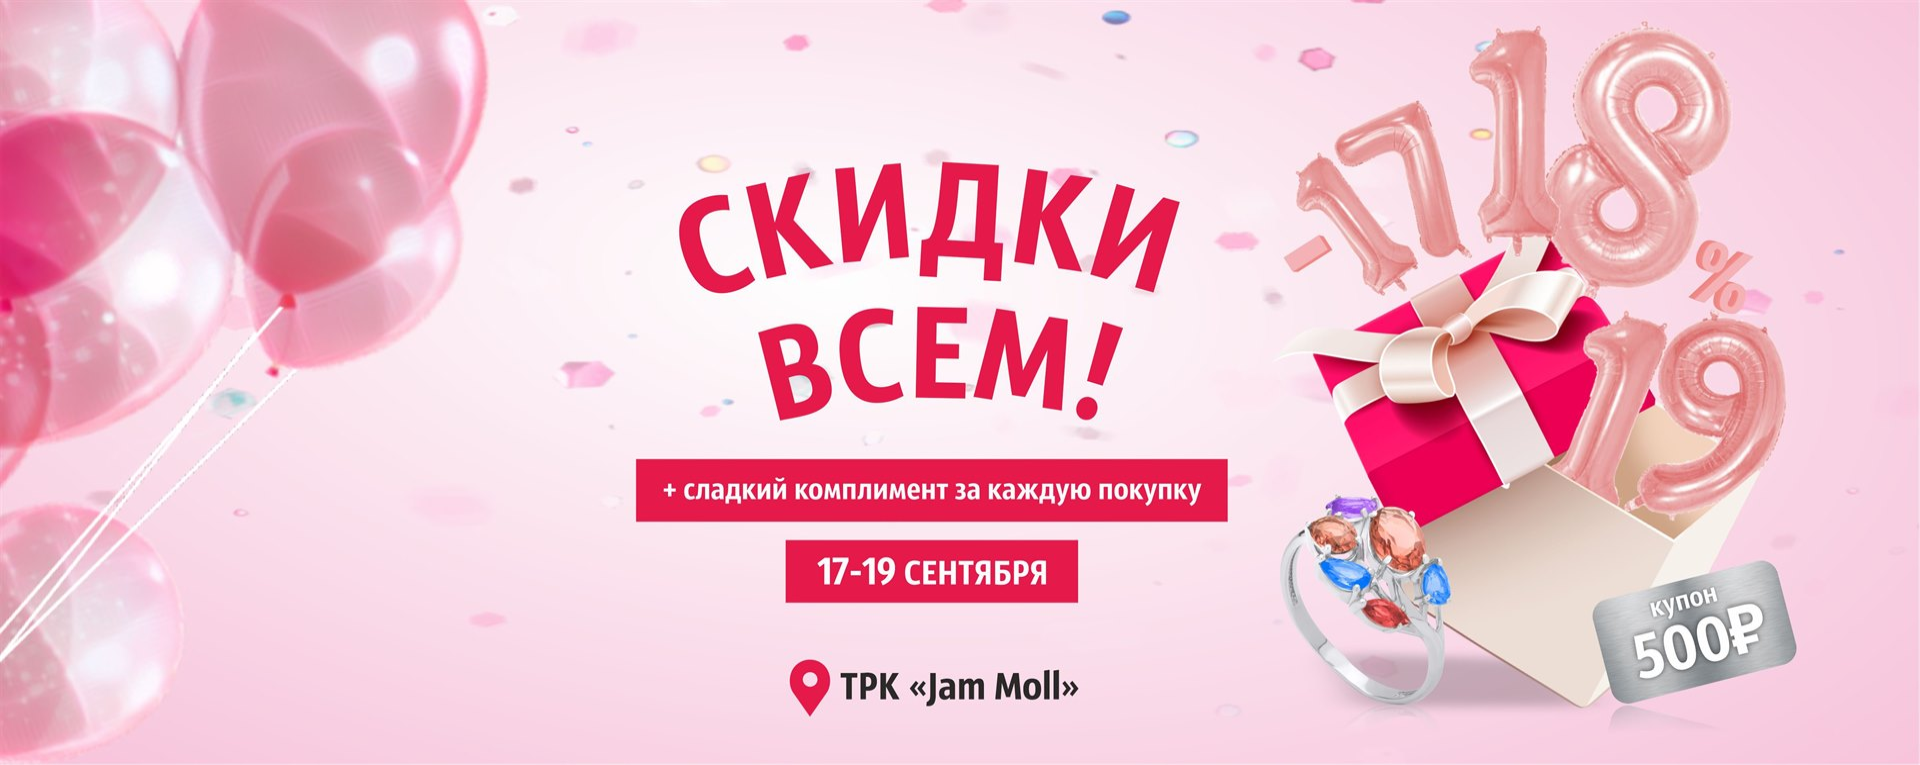 https://www.almazcom.ru/pub/img/Info/24/1.jpg